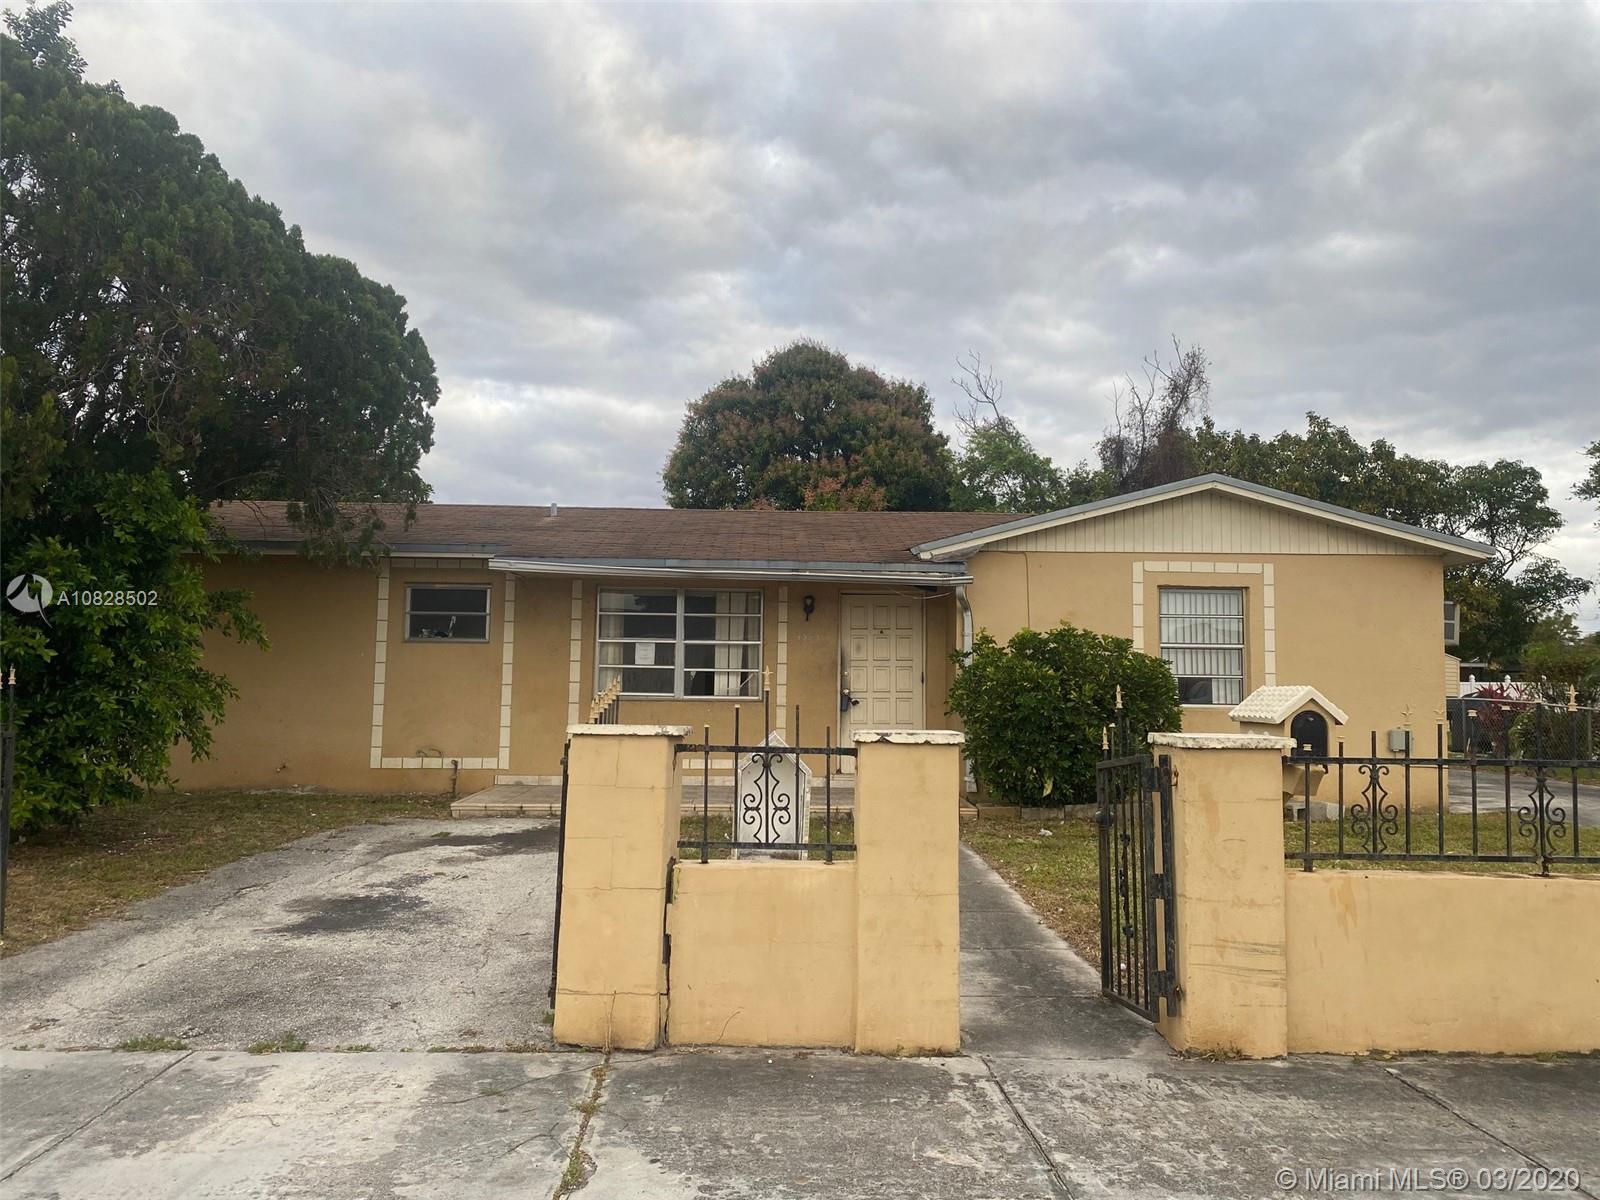 4525 NW 180th St, Miami Gardens, FL 33055 - Miami Gardens, FL real estate listing